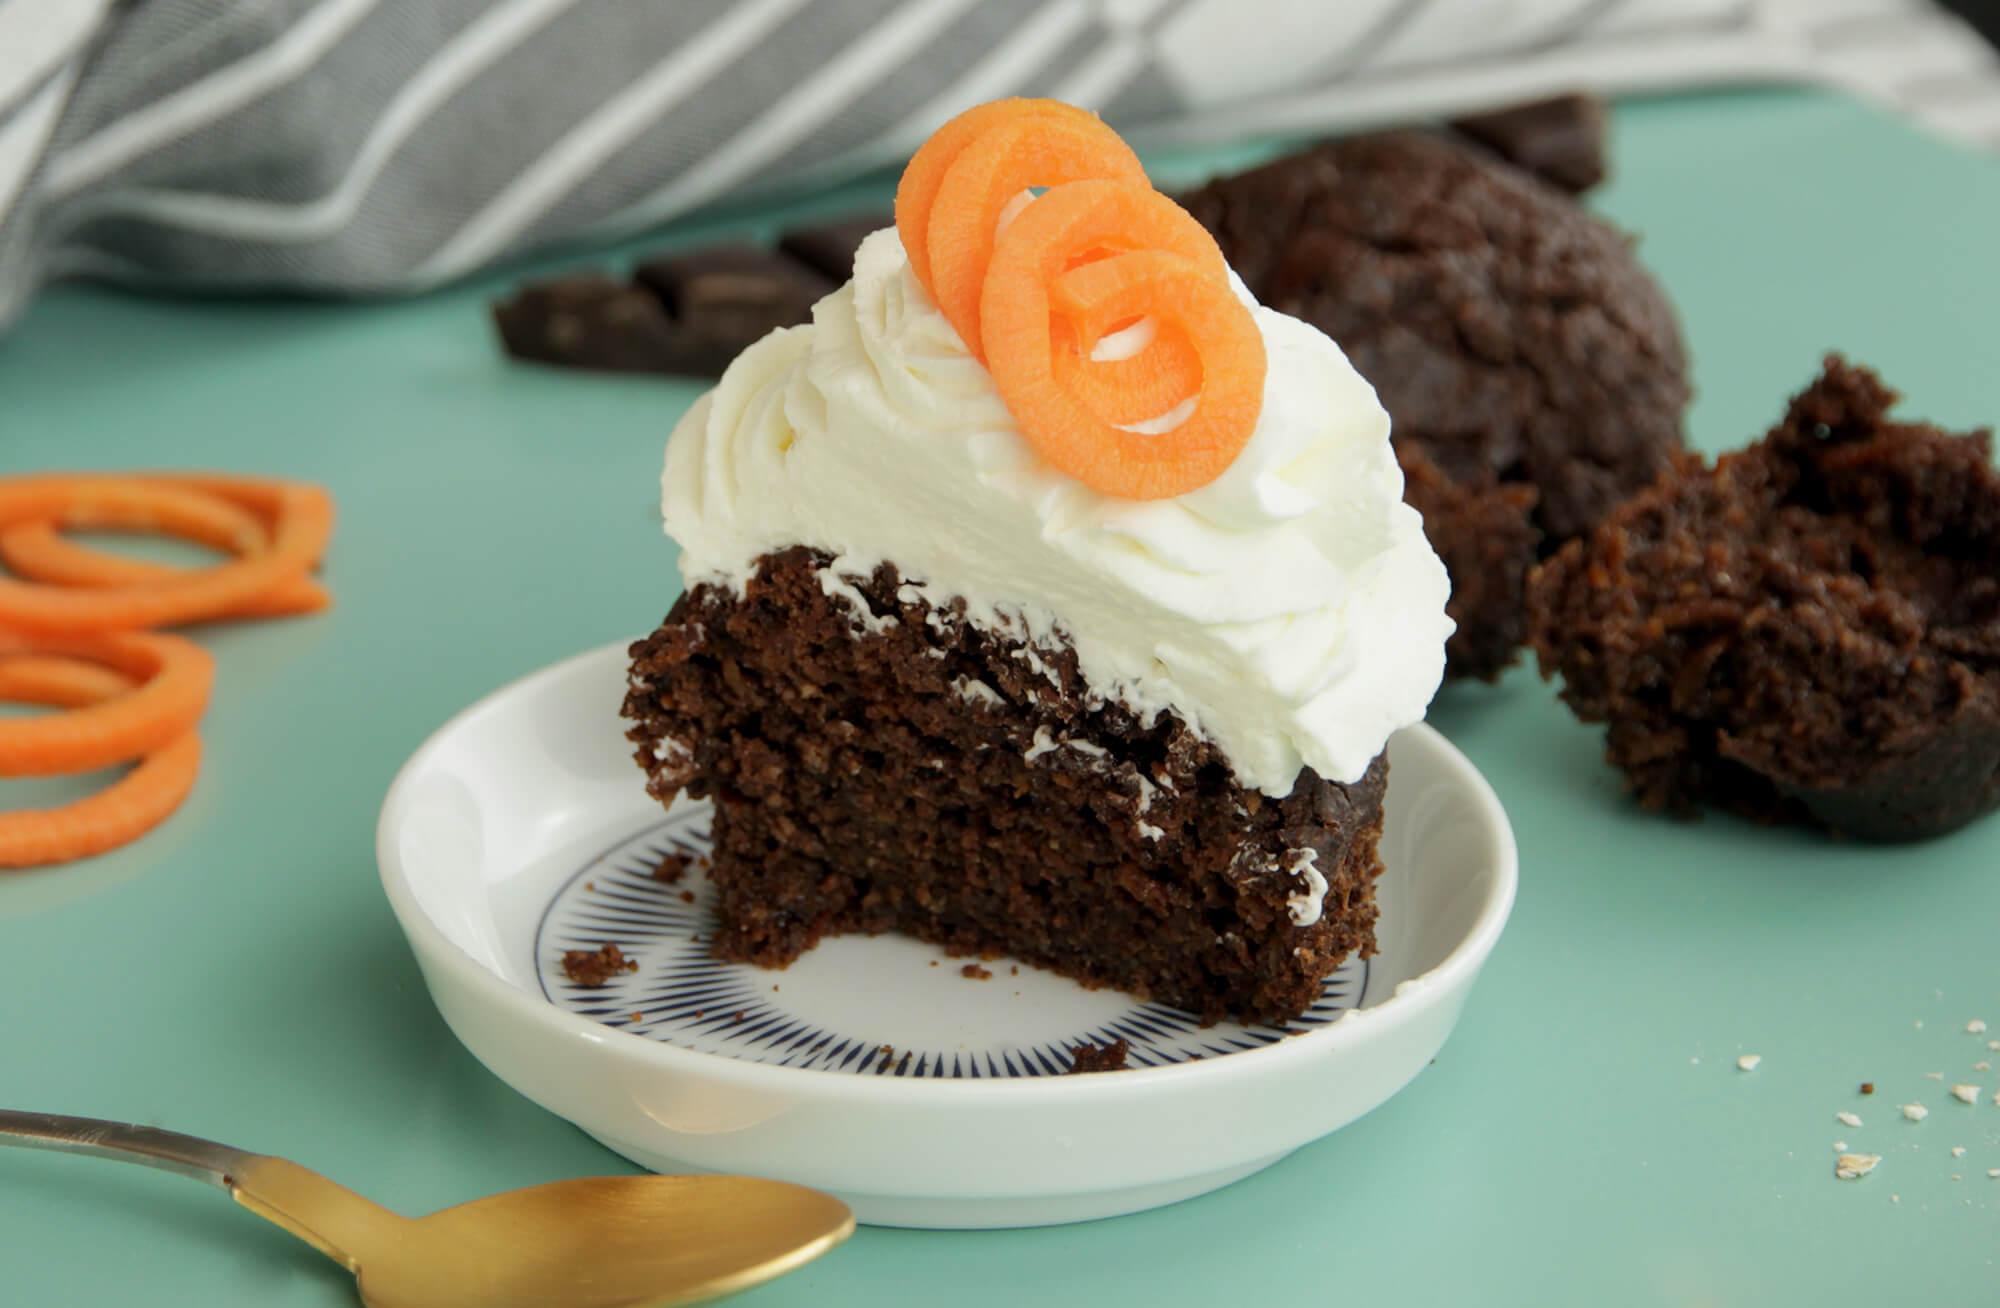 Čokoládovo-mrkvové muffiny z ovsených vločiek